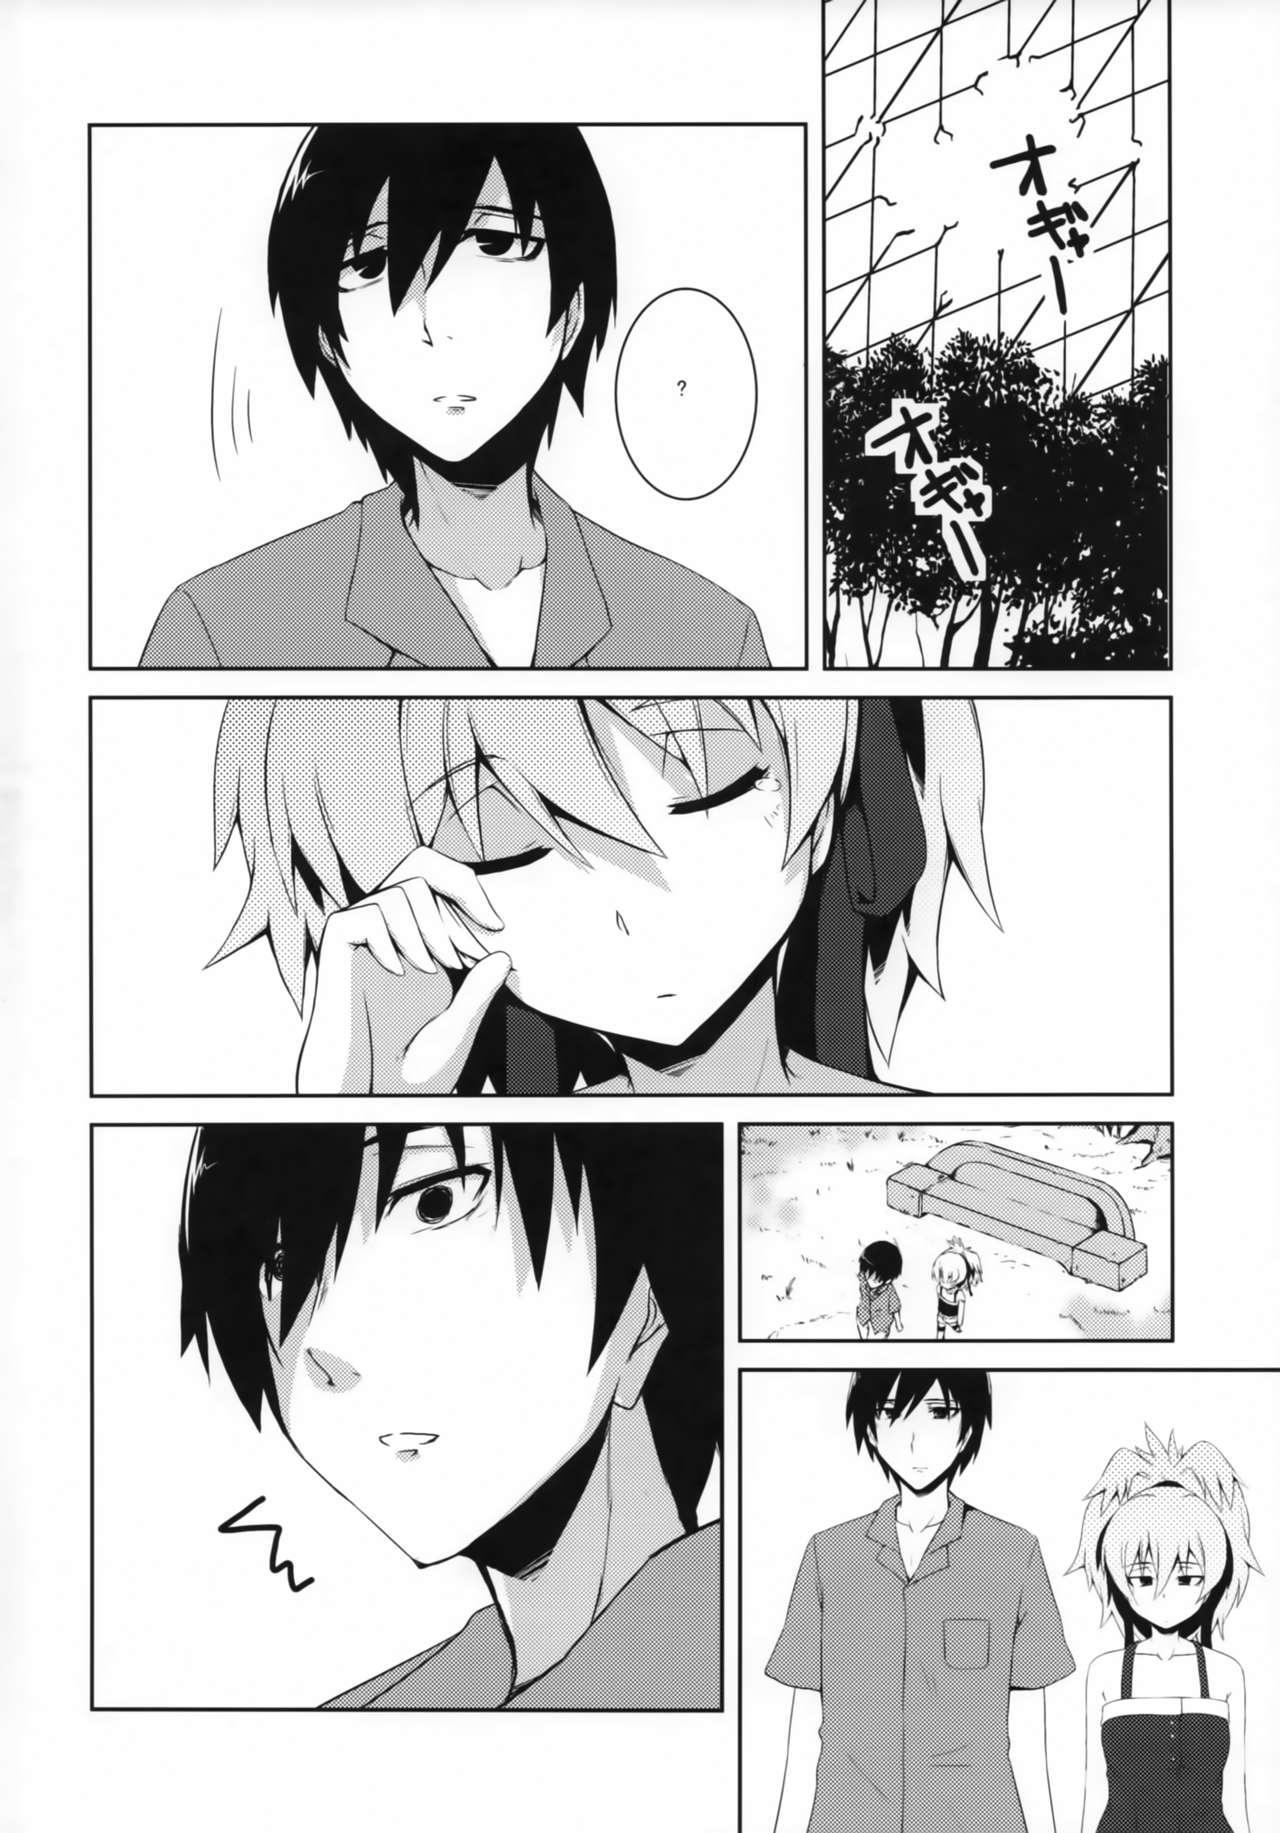 (COMIC1☆5) [Catcher's mitt of silver (Kaname Nagi)] ~Giniro no Negai~ (DARKER THAN BLACK) 2